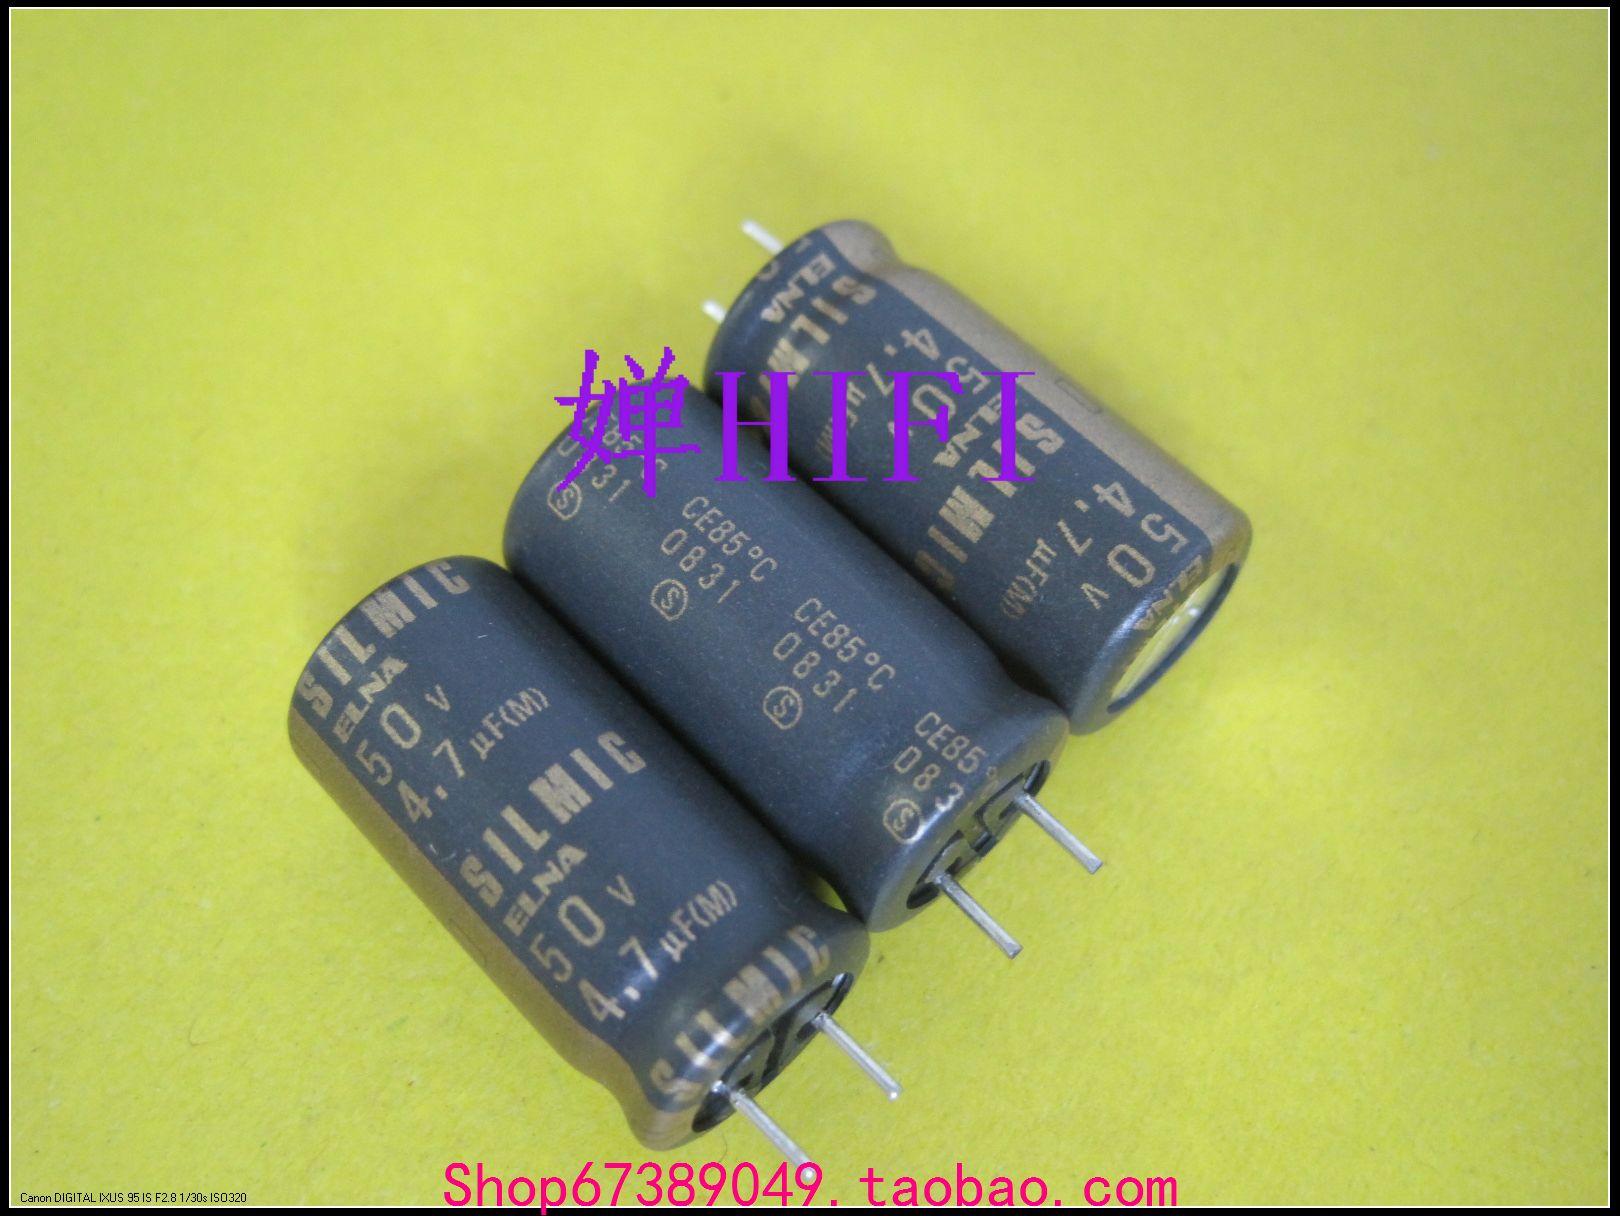 2019 hot sale 20PCS50PCS Japan ELNA original SILMIC brushed copper foot audio capacitor 50v4.7uf 13x25 free shipping